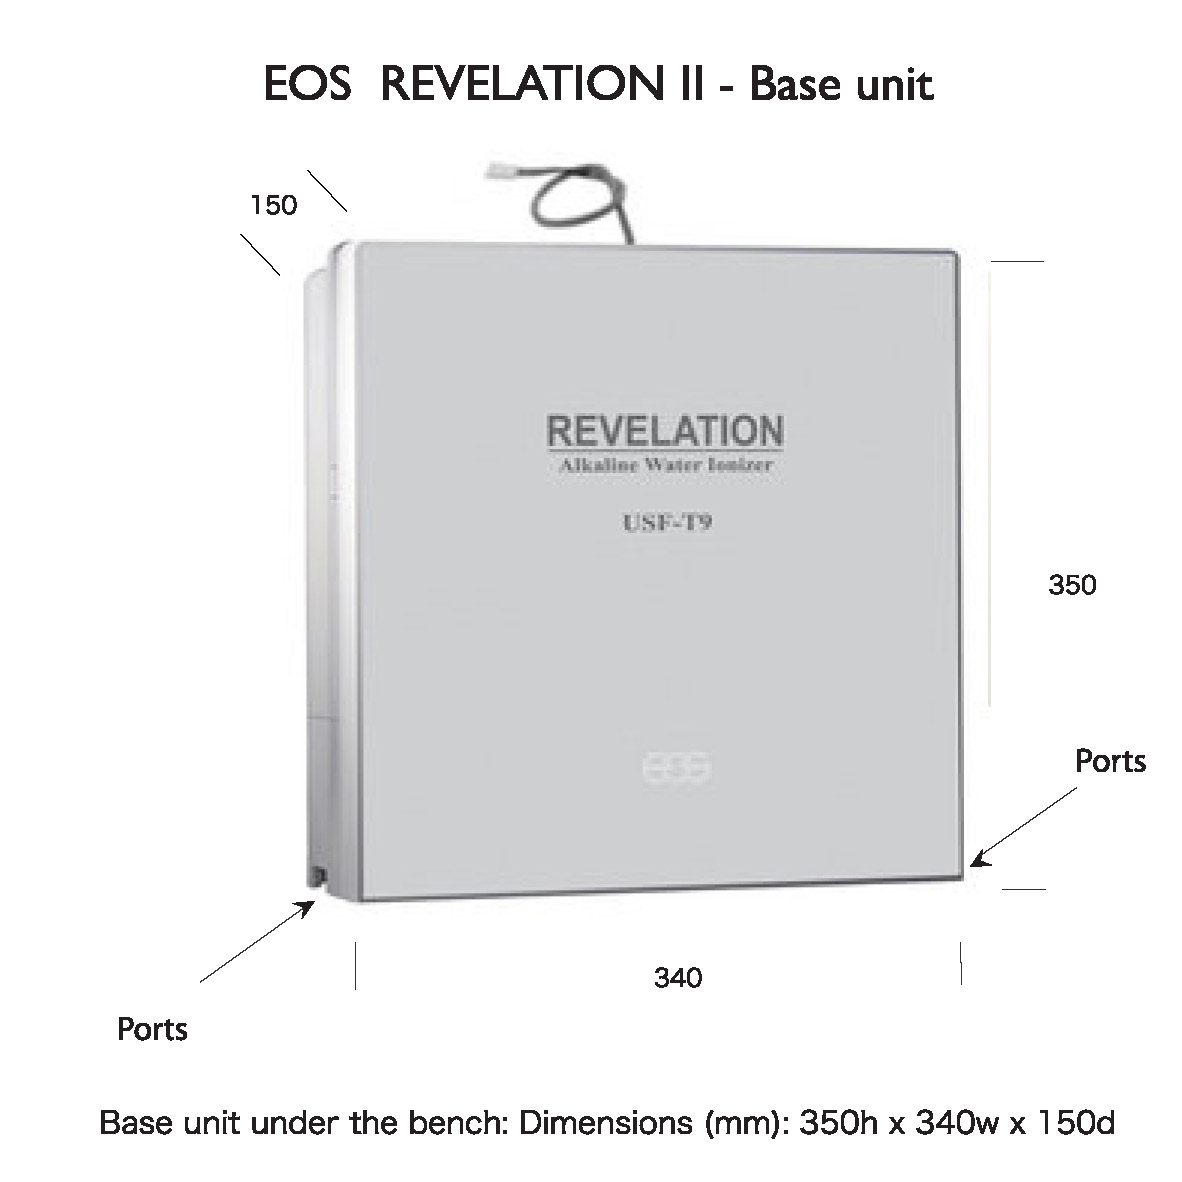 EOS Revelation -dimensions of base unit